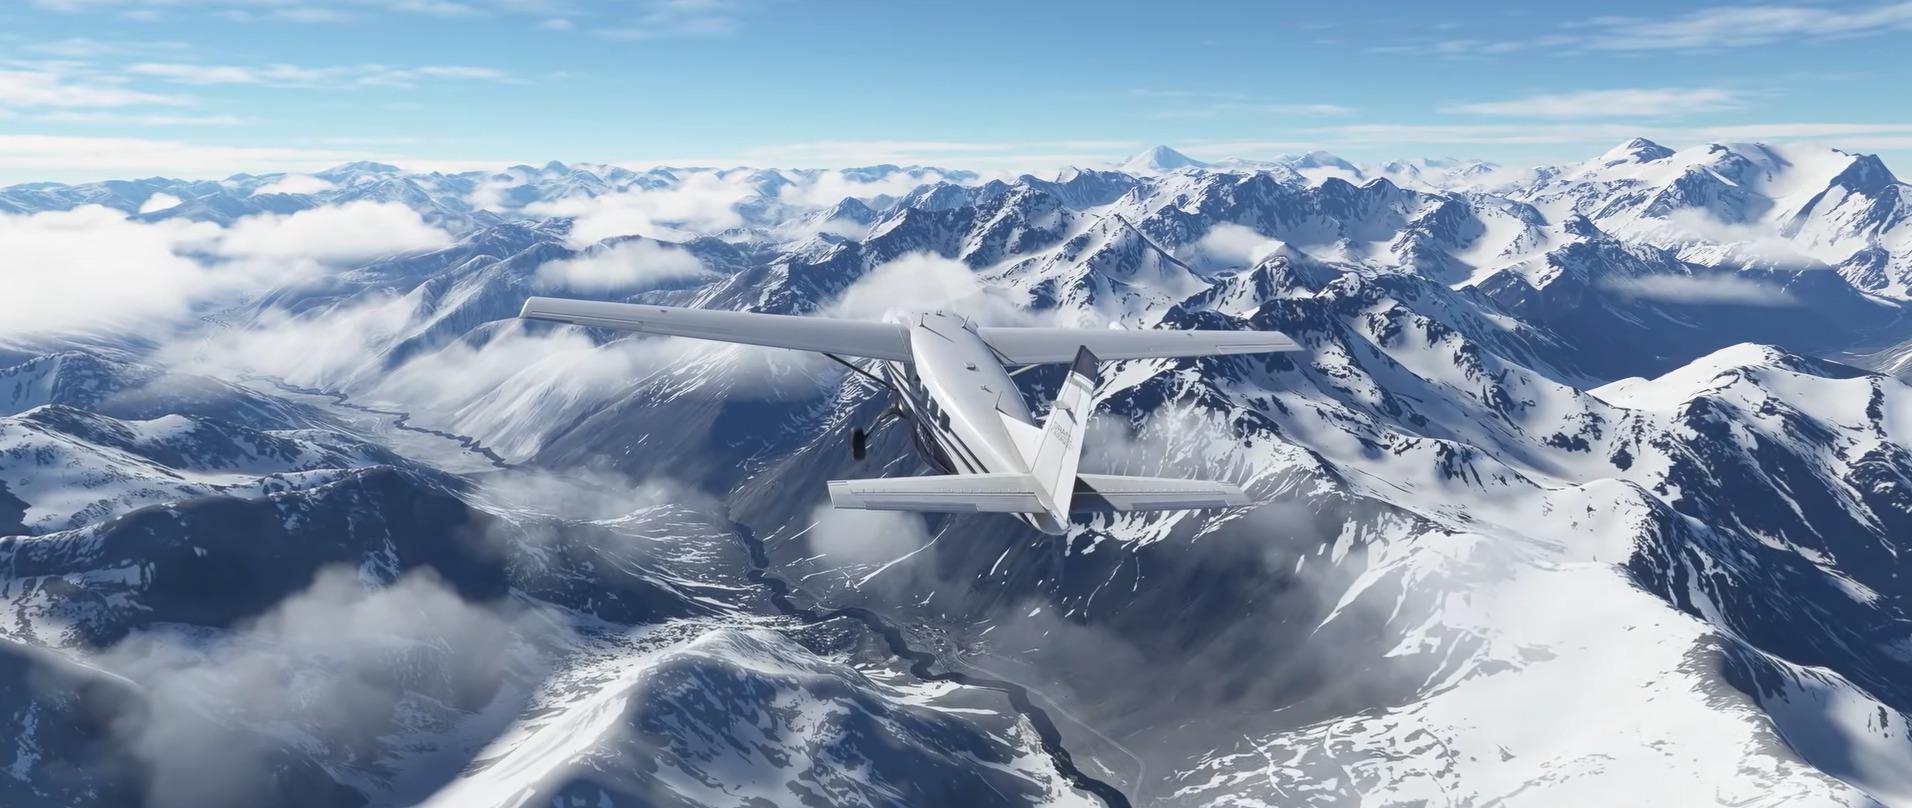 Microsoft Flight Simulator 2020 nieve